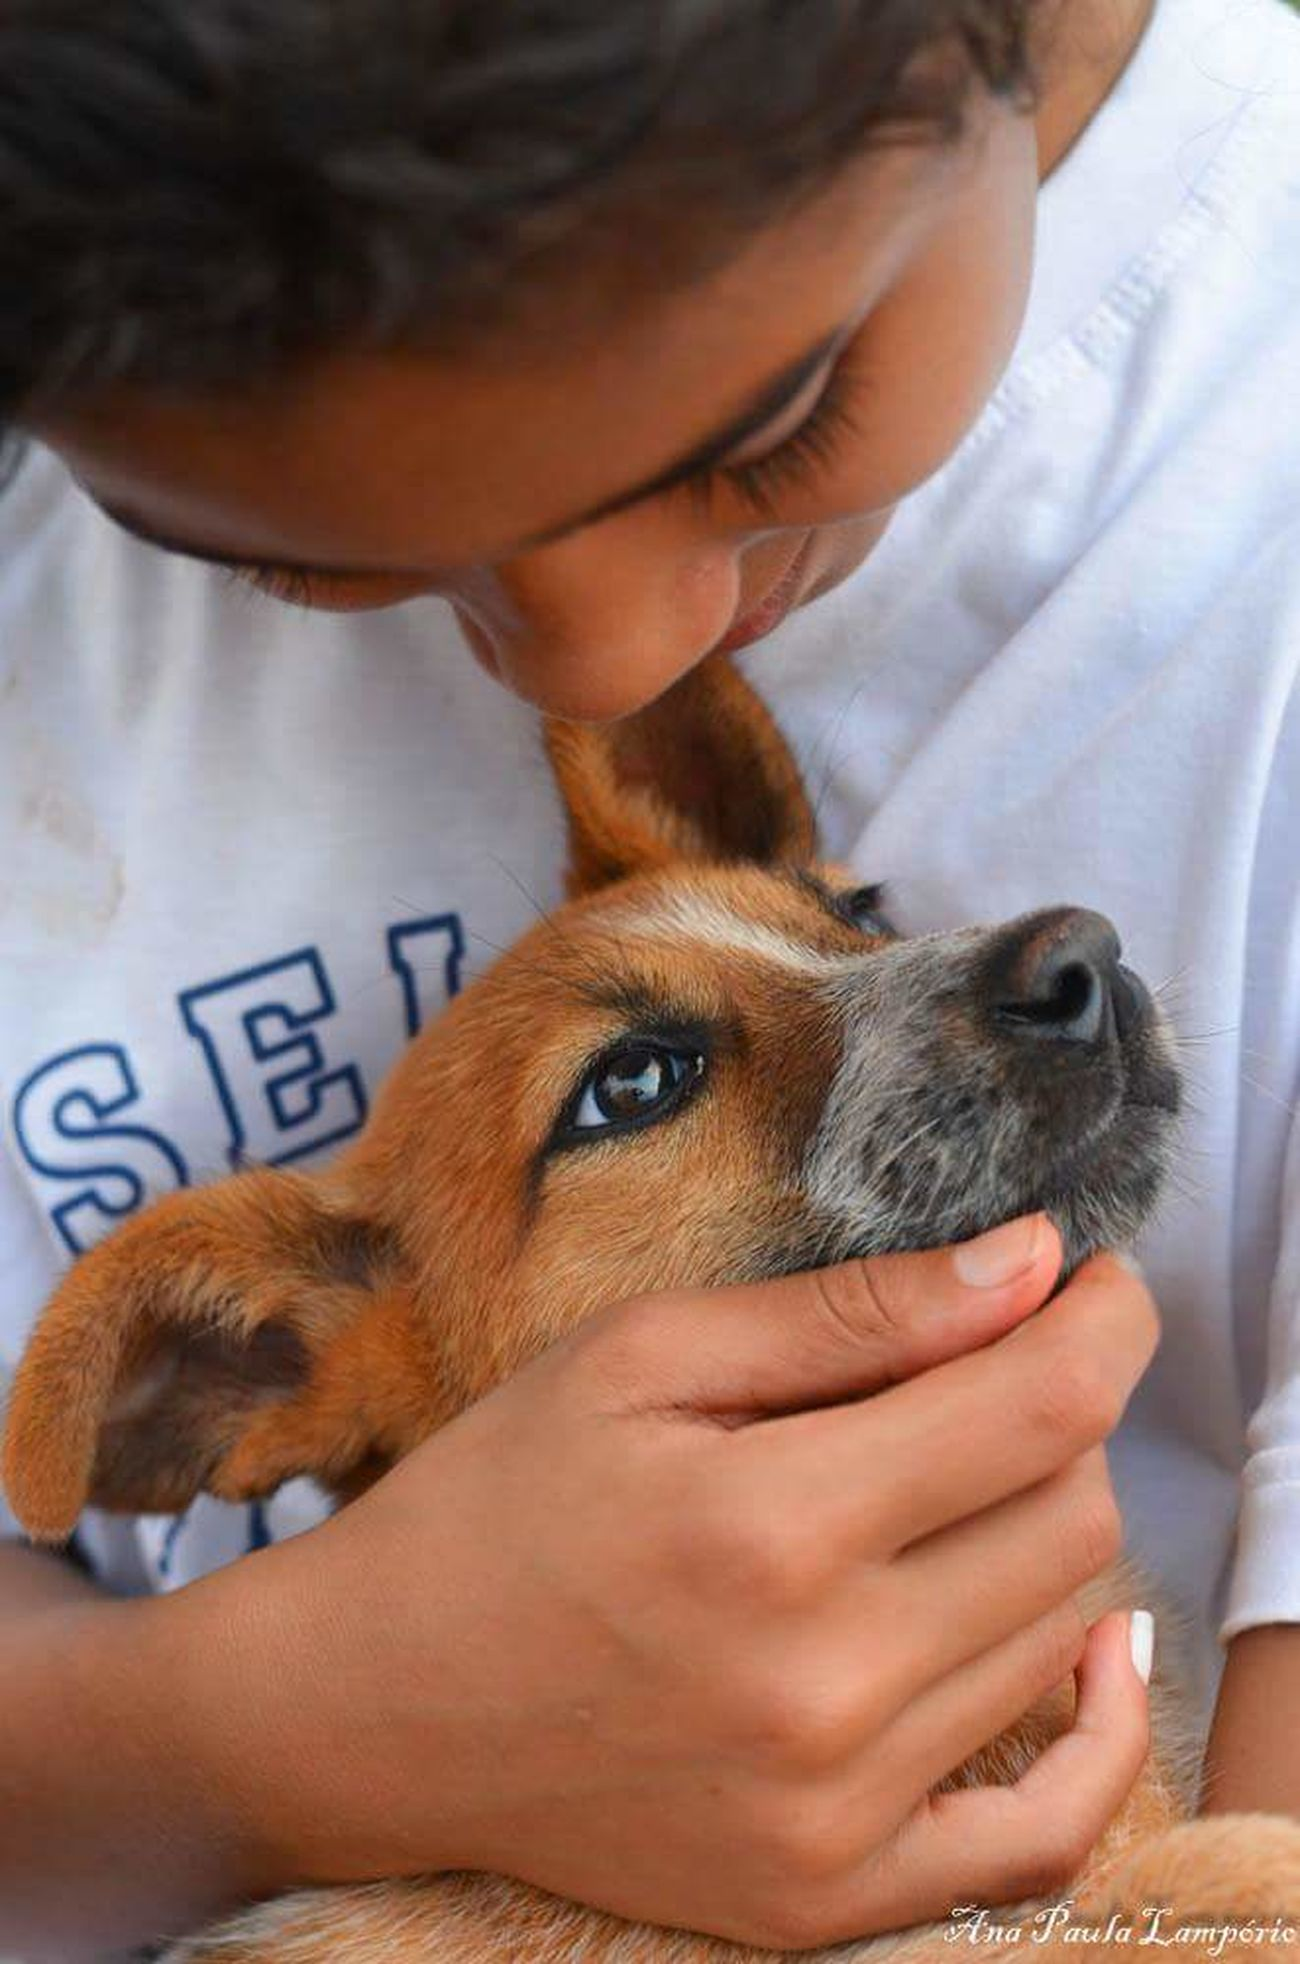 AmizadeVerdadeira Pets Dog Domestic Animals MelhorCompanhia MelhorAmigo Fazenda Nikon Nikon D5100  Nikonphotographer Nikontop Nikon_photography Nikon Photography 50mm F1.8 Brasildosmeusolhos_ Paraná Brazil